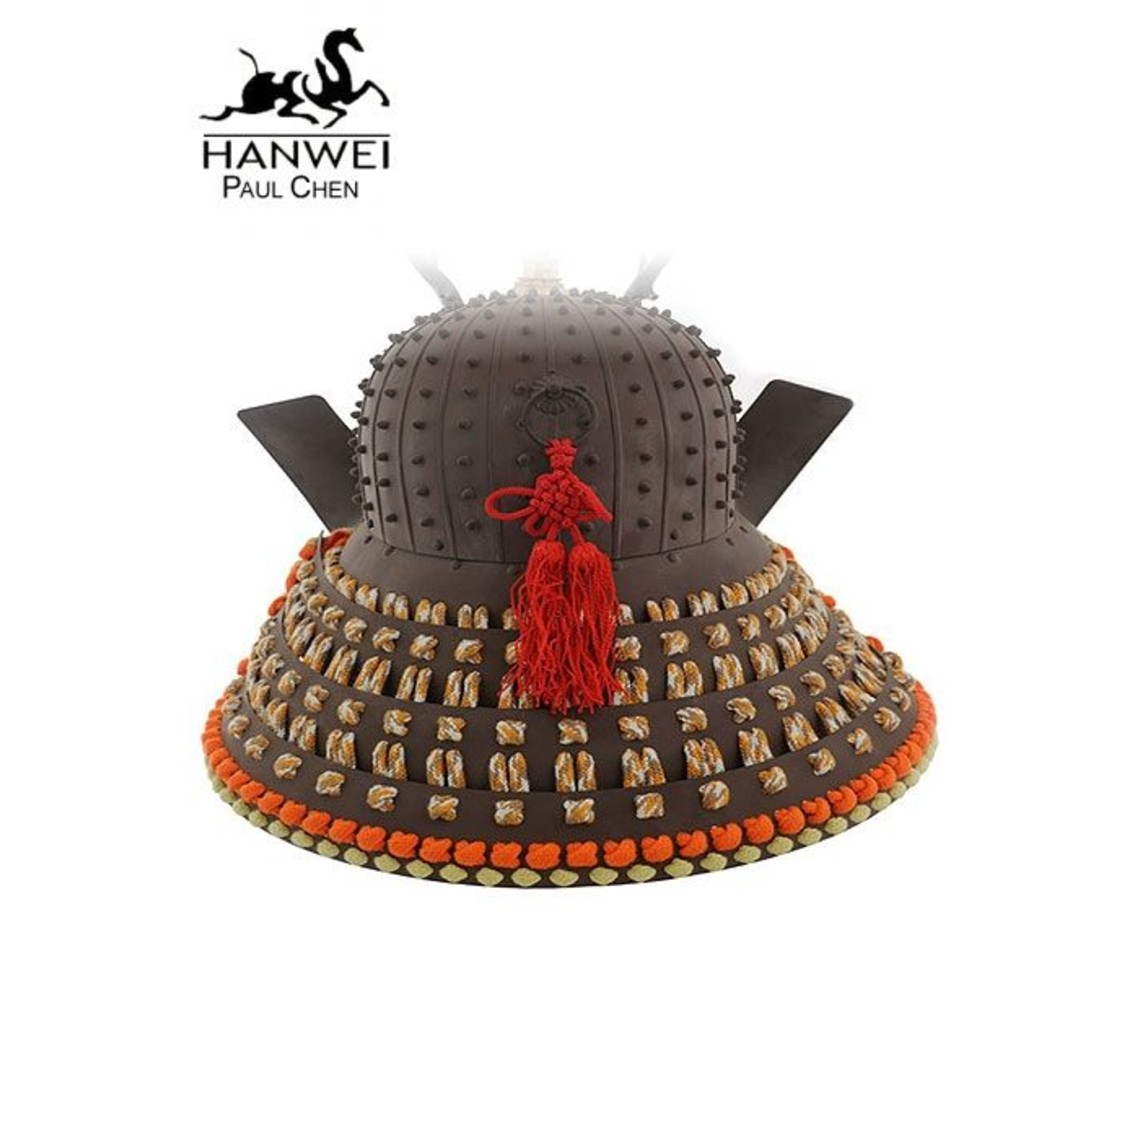 Hanwei Daisho Kake Helm (Kabuto)